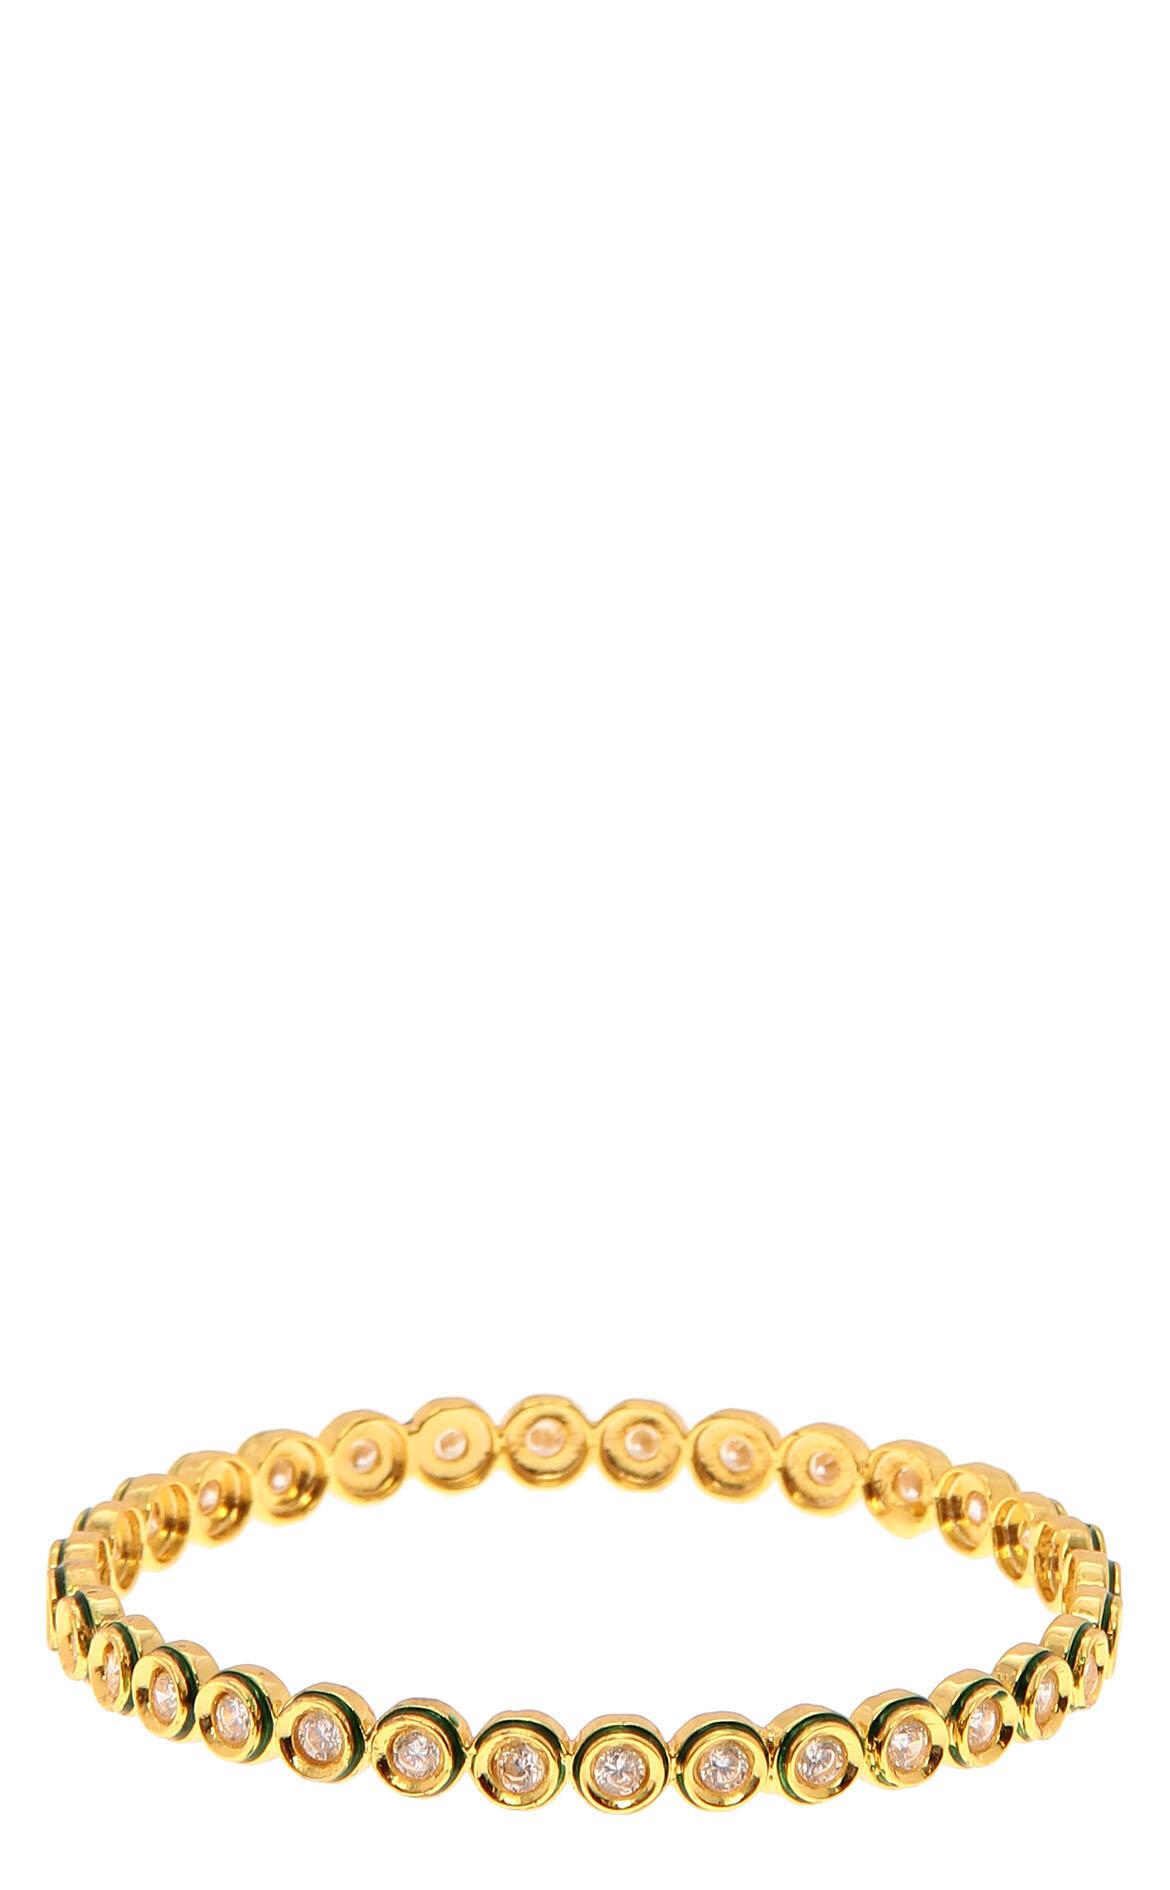 Madhok Jewelry-Madhok Jewelry Bilezik